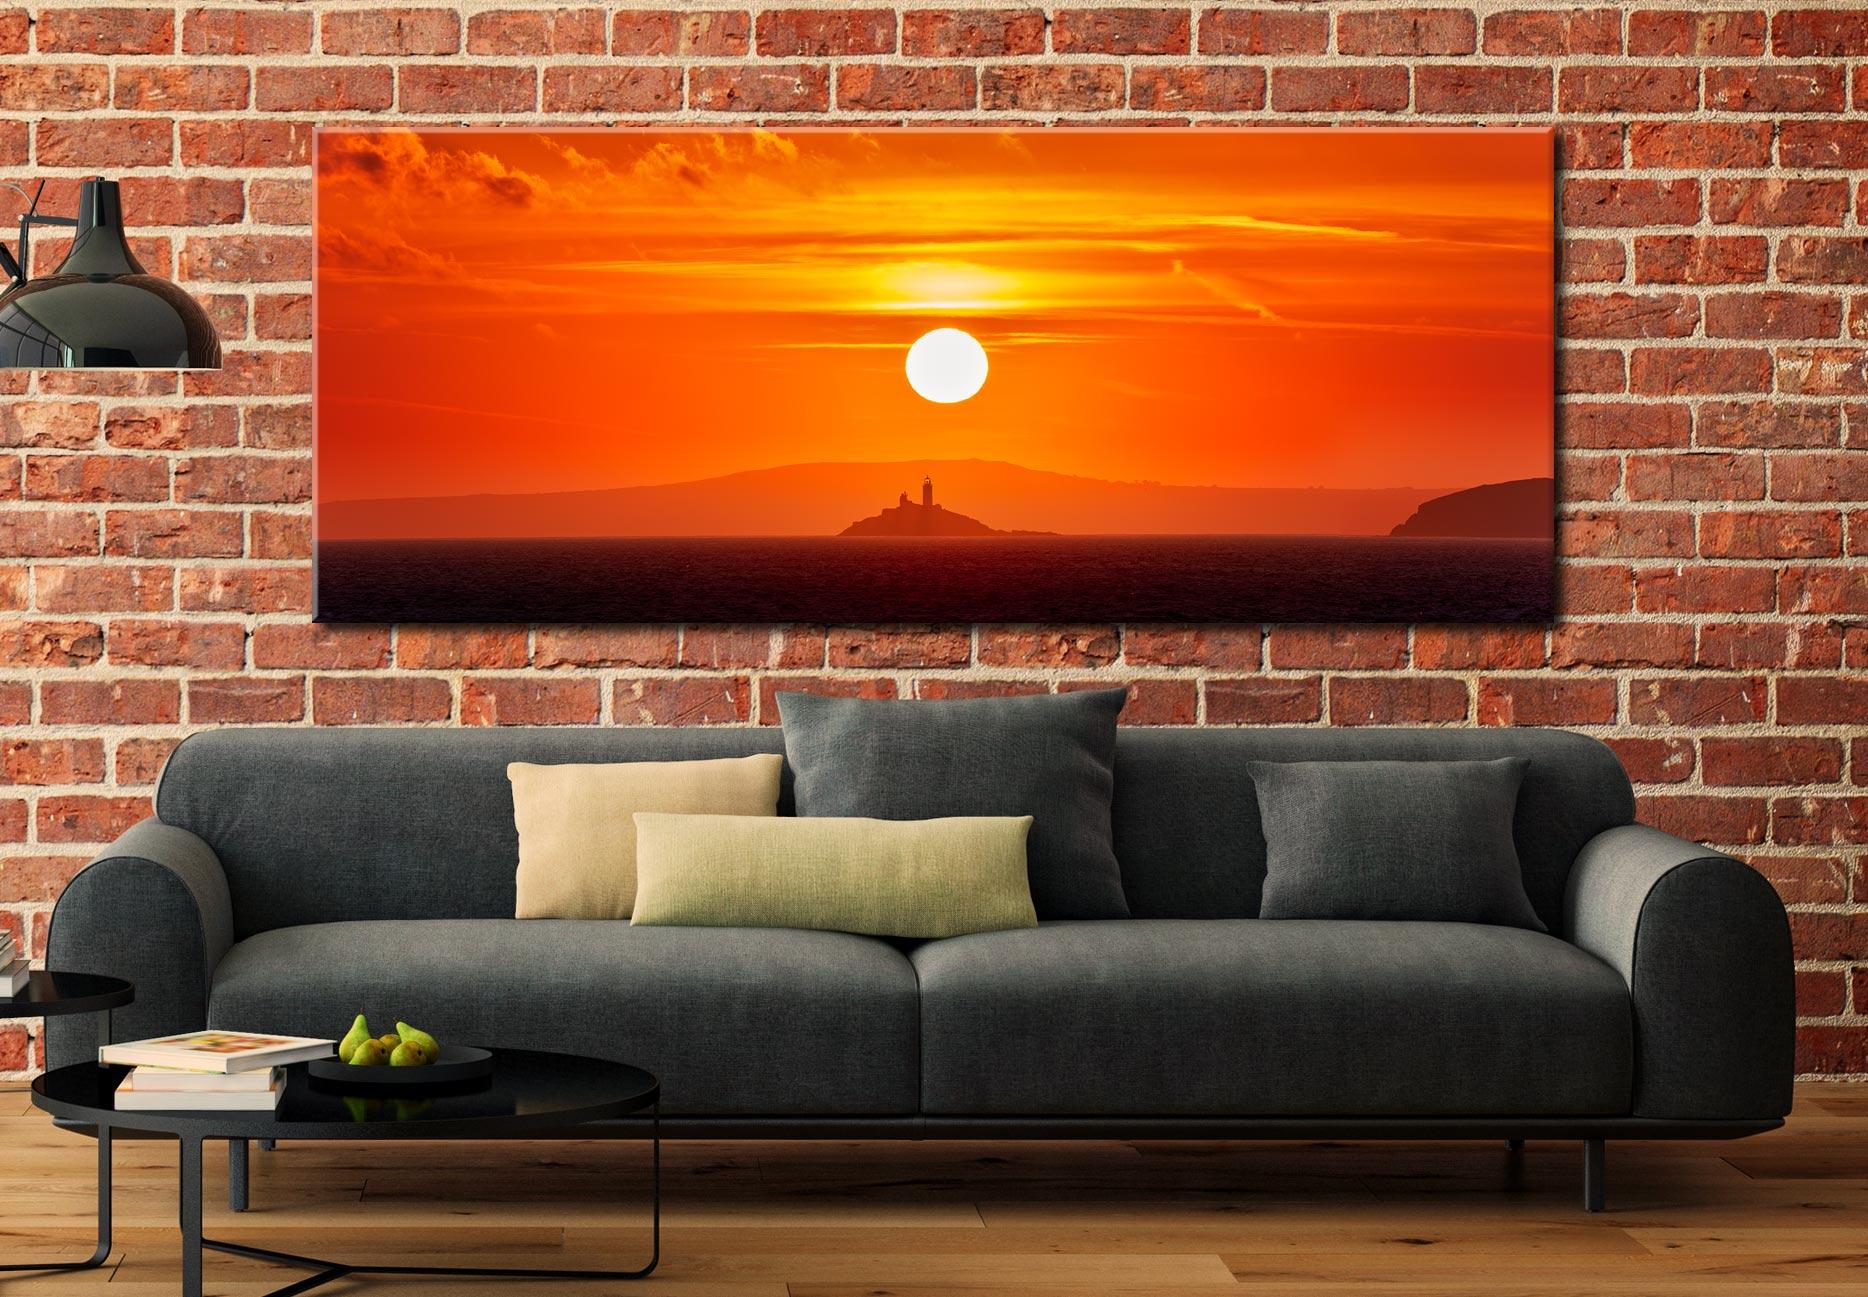 Godrevy Lighthouse Sunrise - Canvas Print on Wall